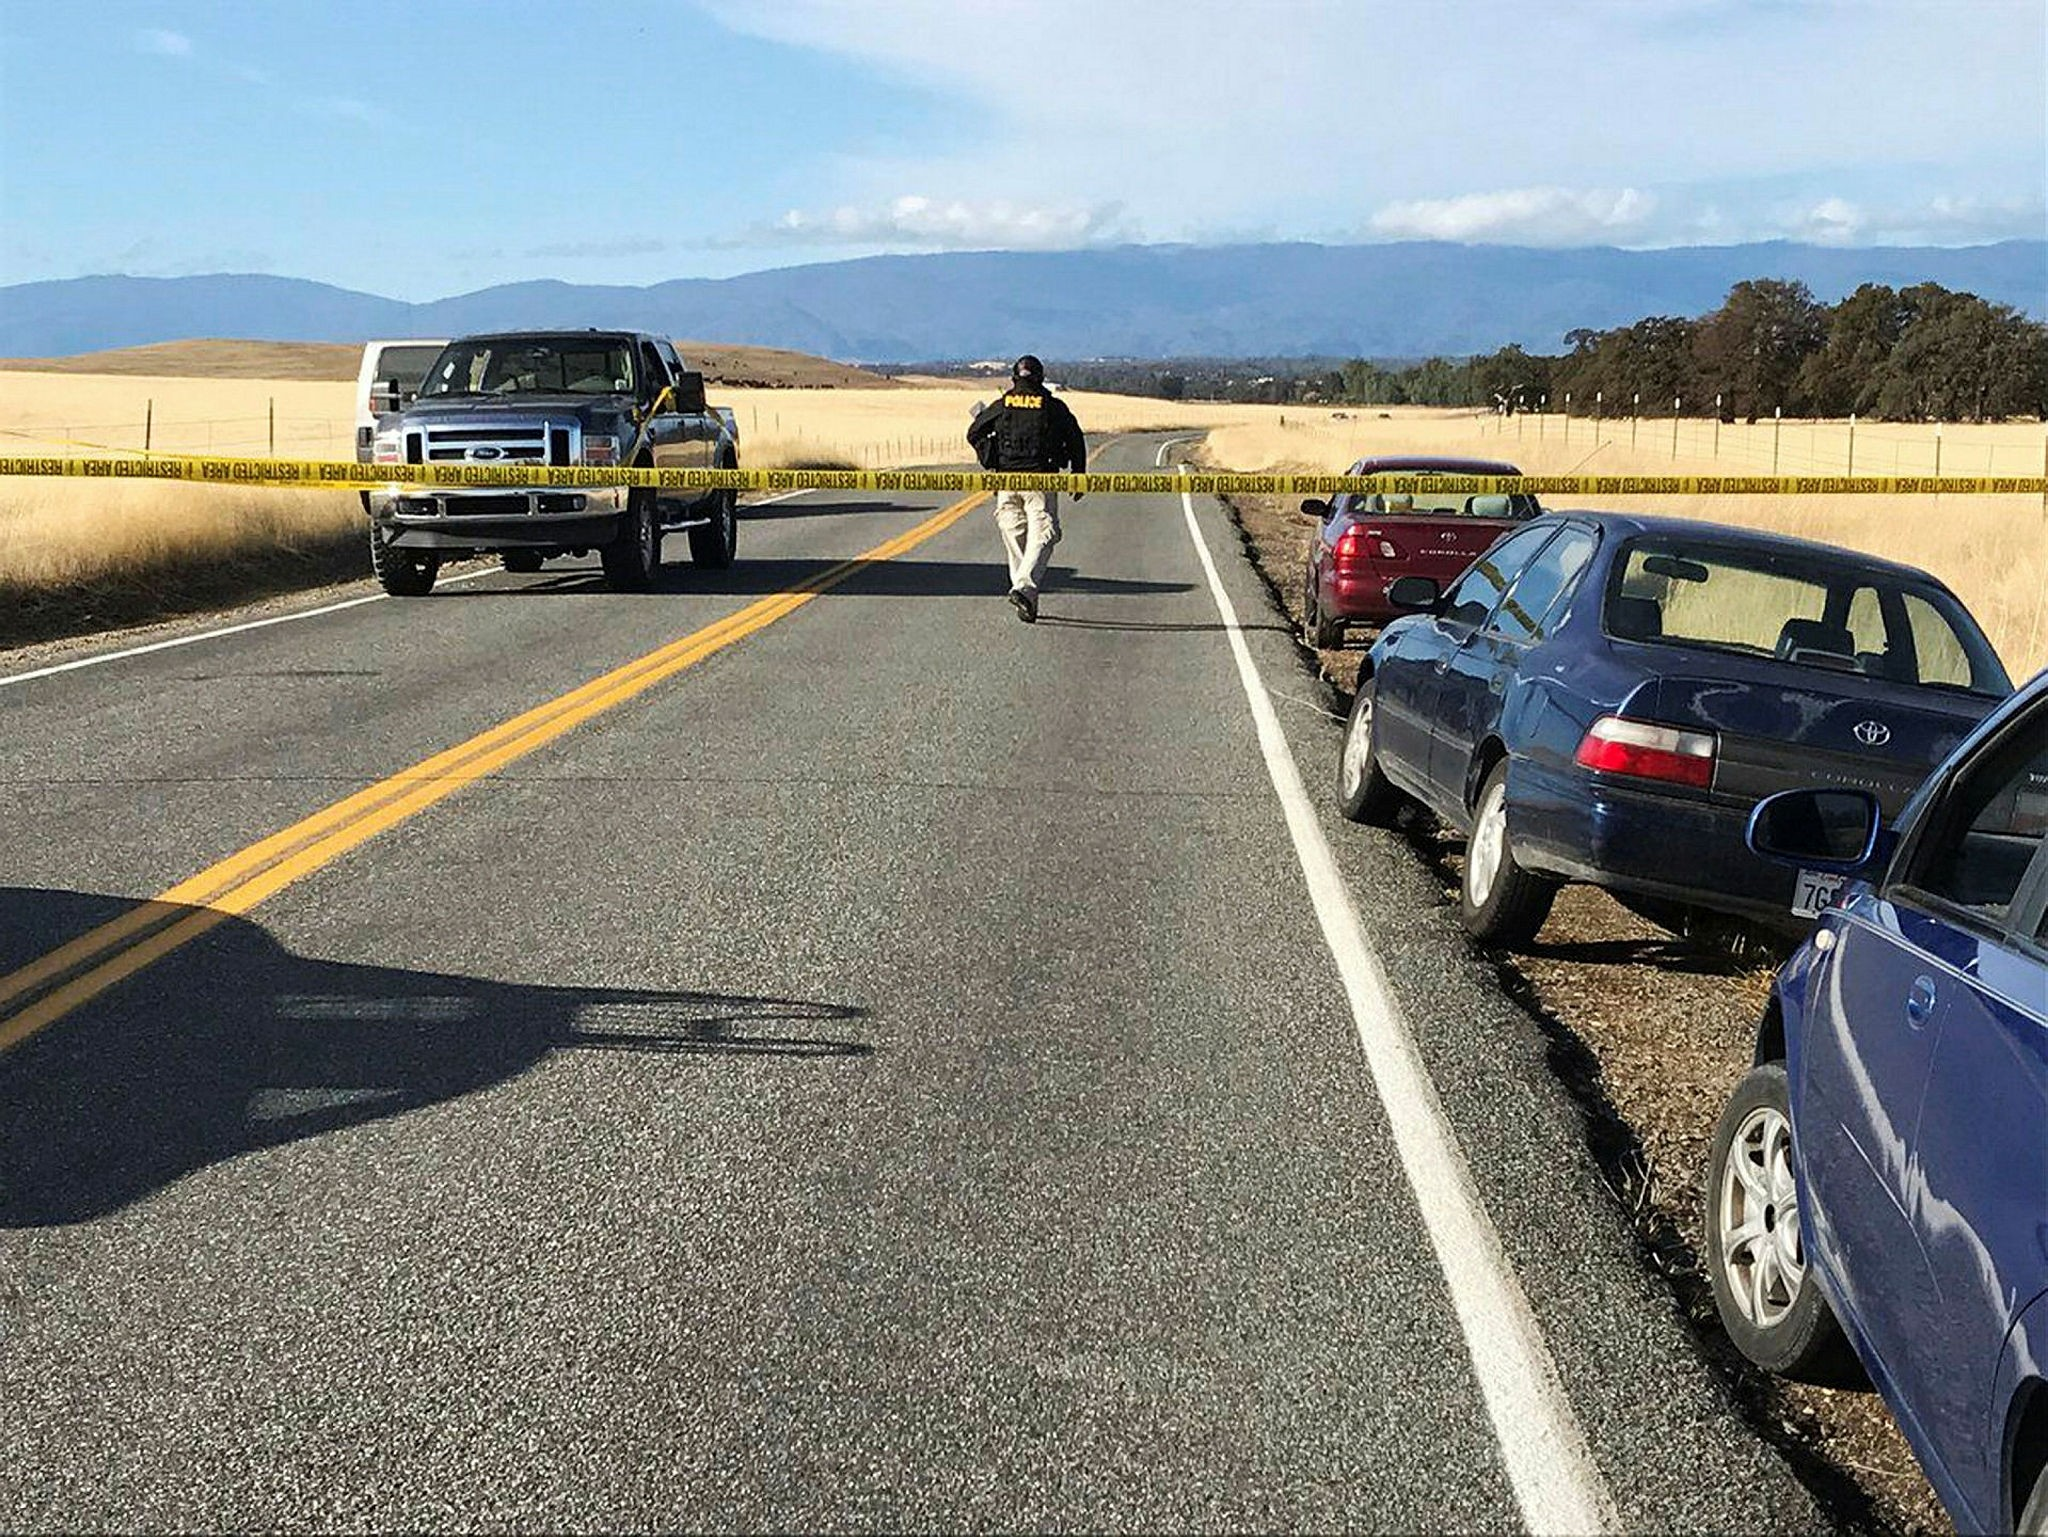 Crime tape blocks off Rancho Tehama Road in California, following a fatal shooting on Tuesday, Nov. 14, 2017. (AP Photo)